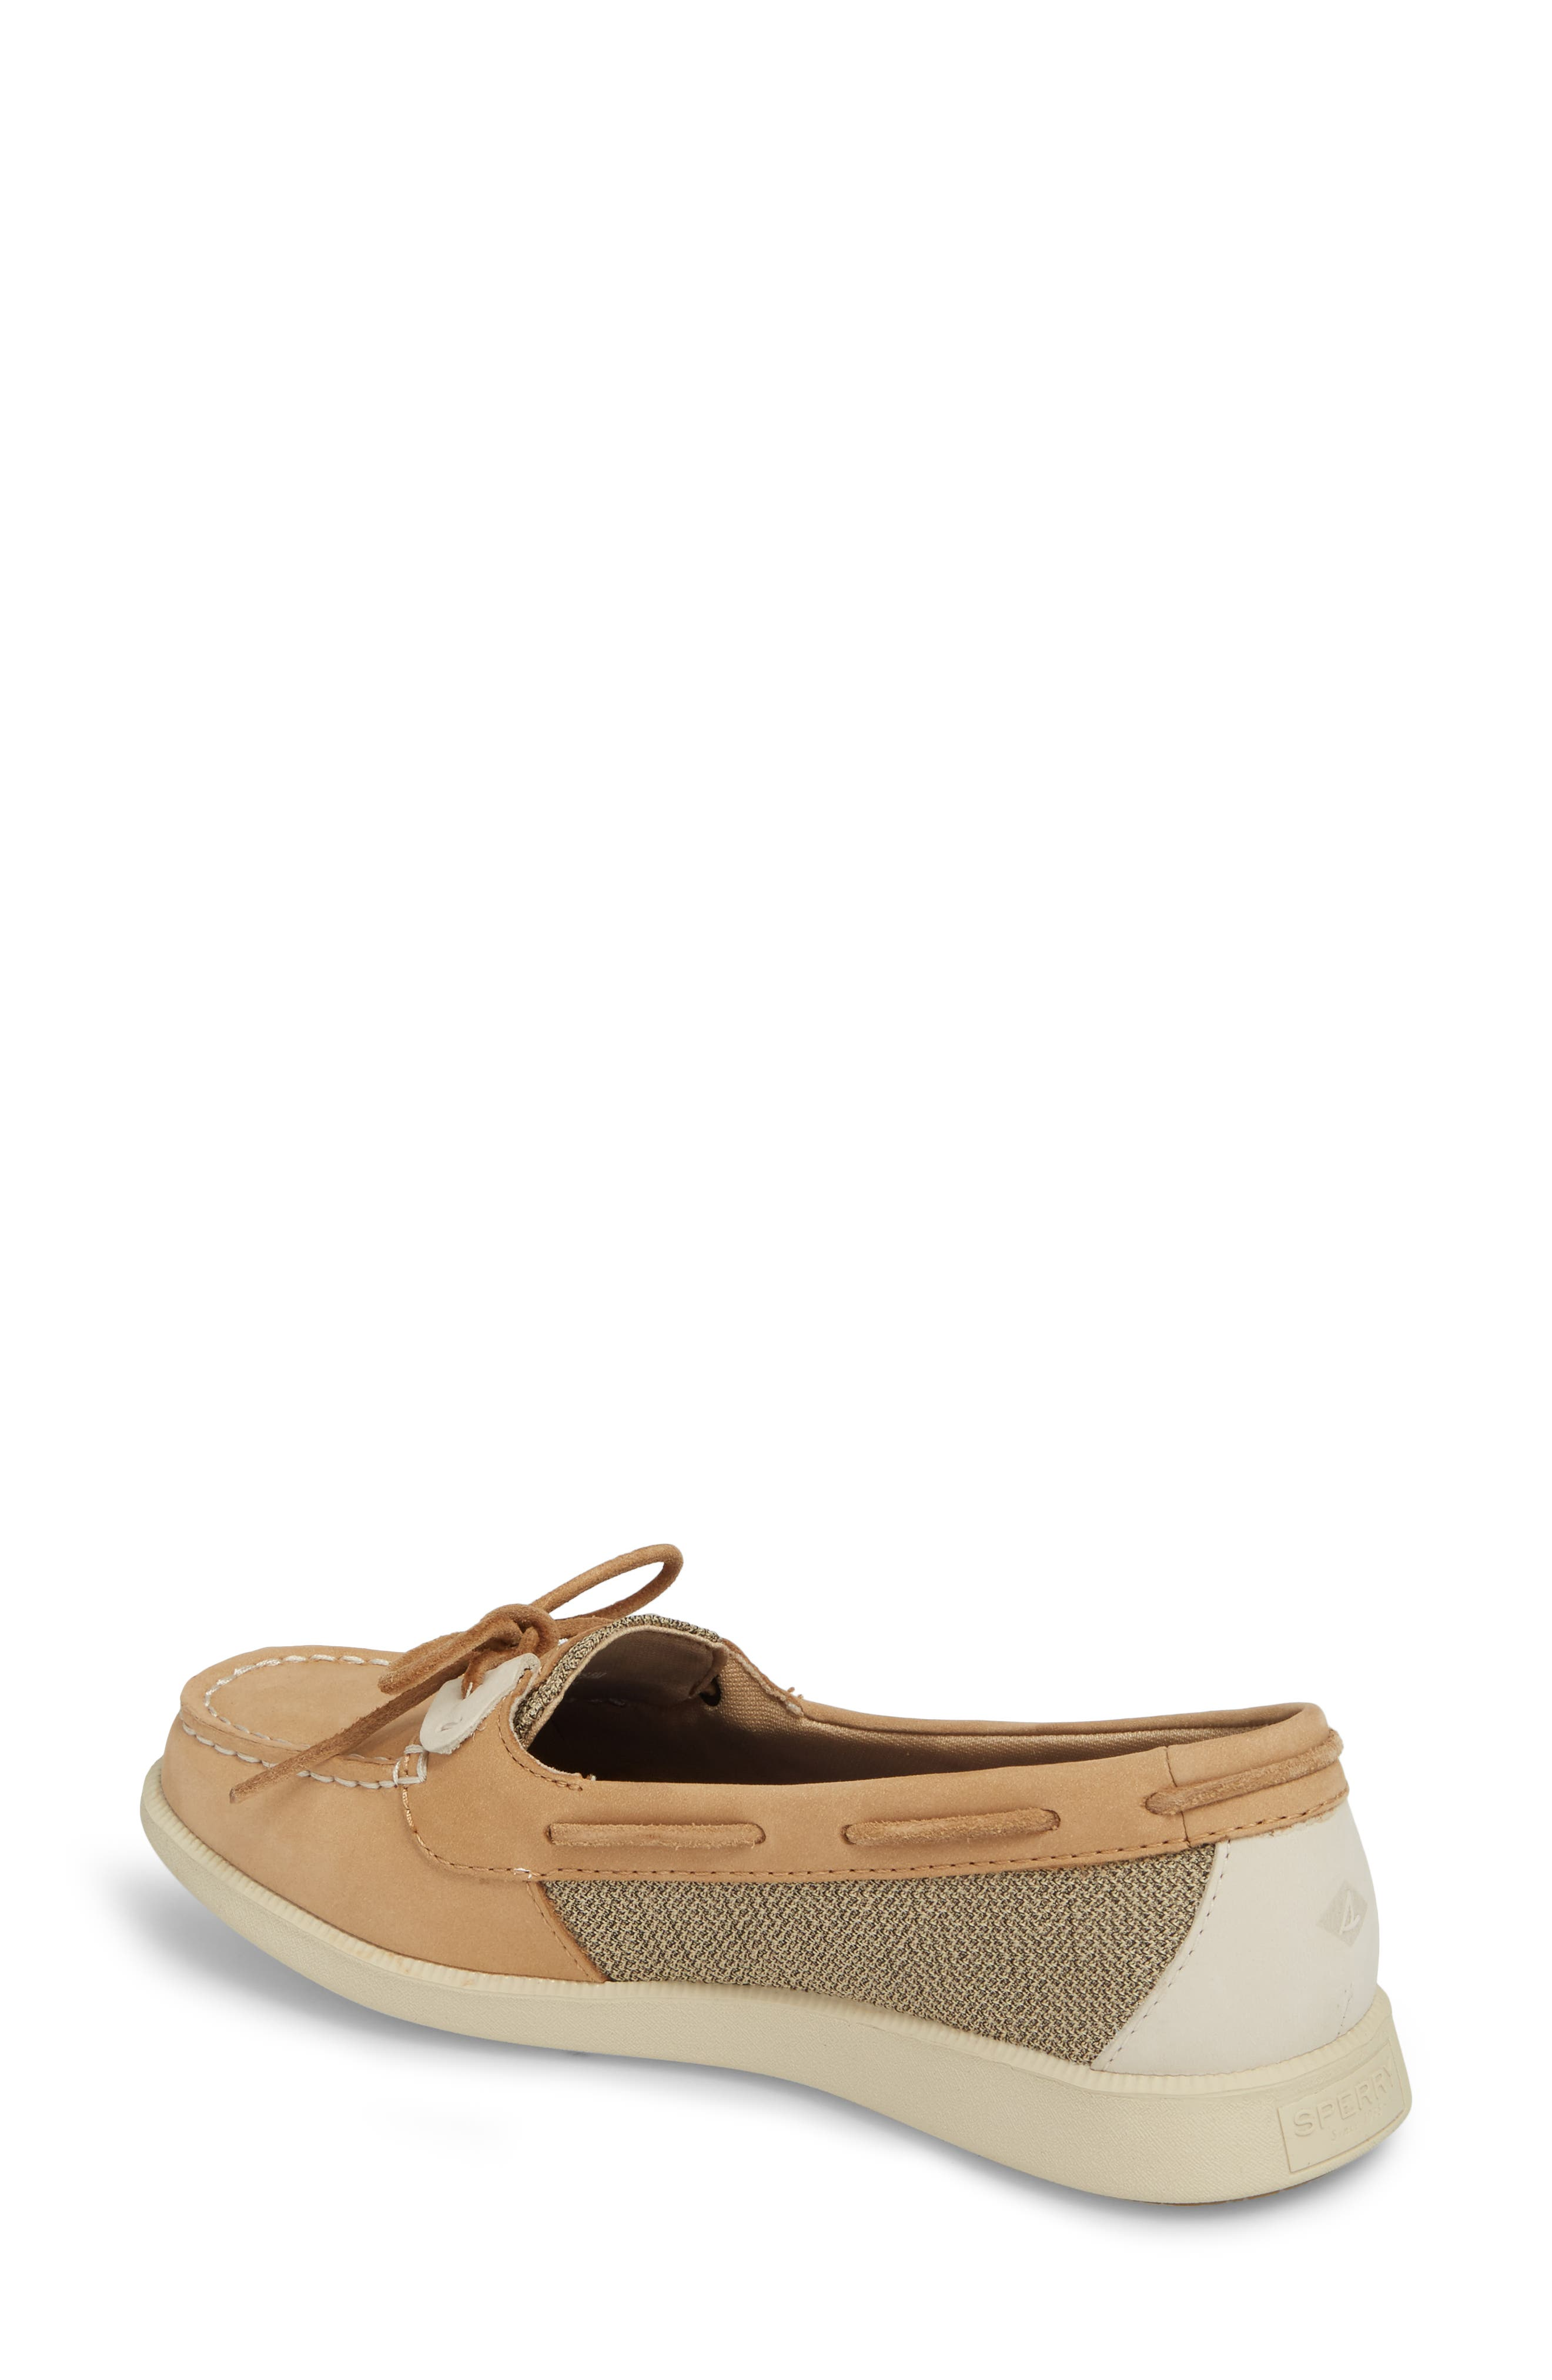 Oasis Boat Shoe,                             Alternate thumbnail 2, color,                             LINEN OAT LEATHER